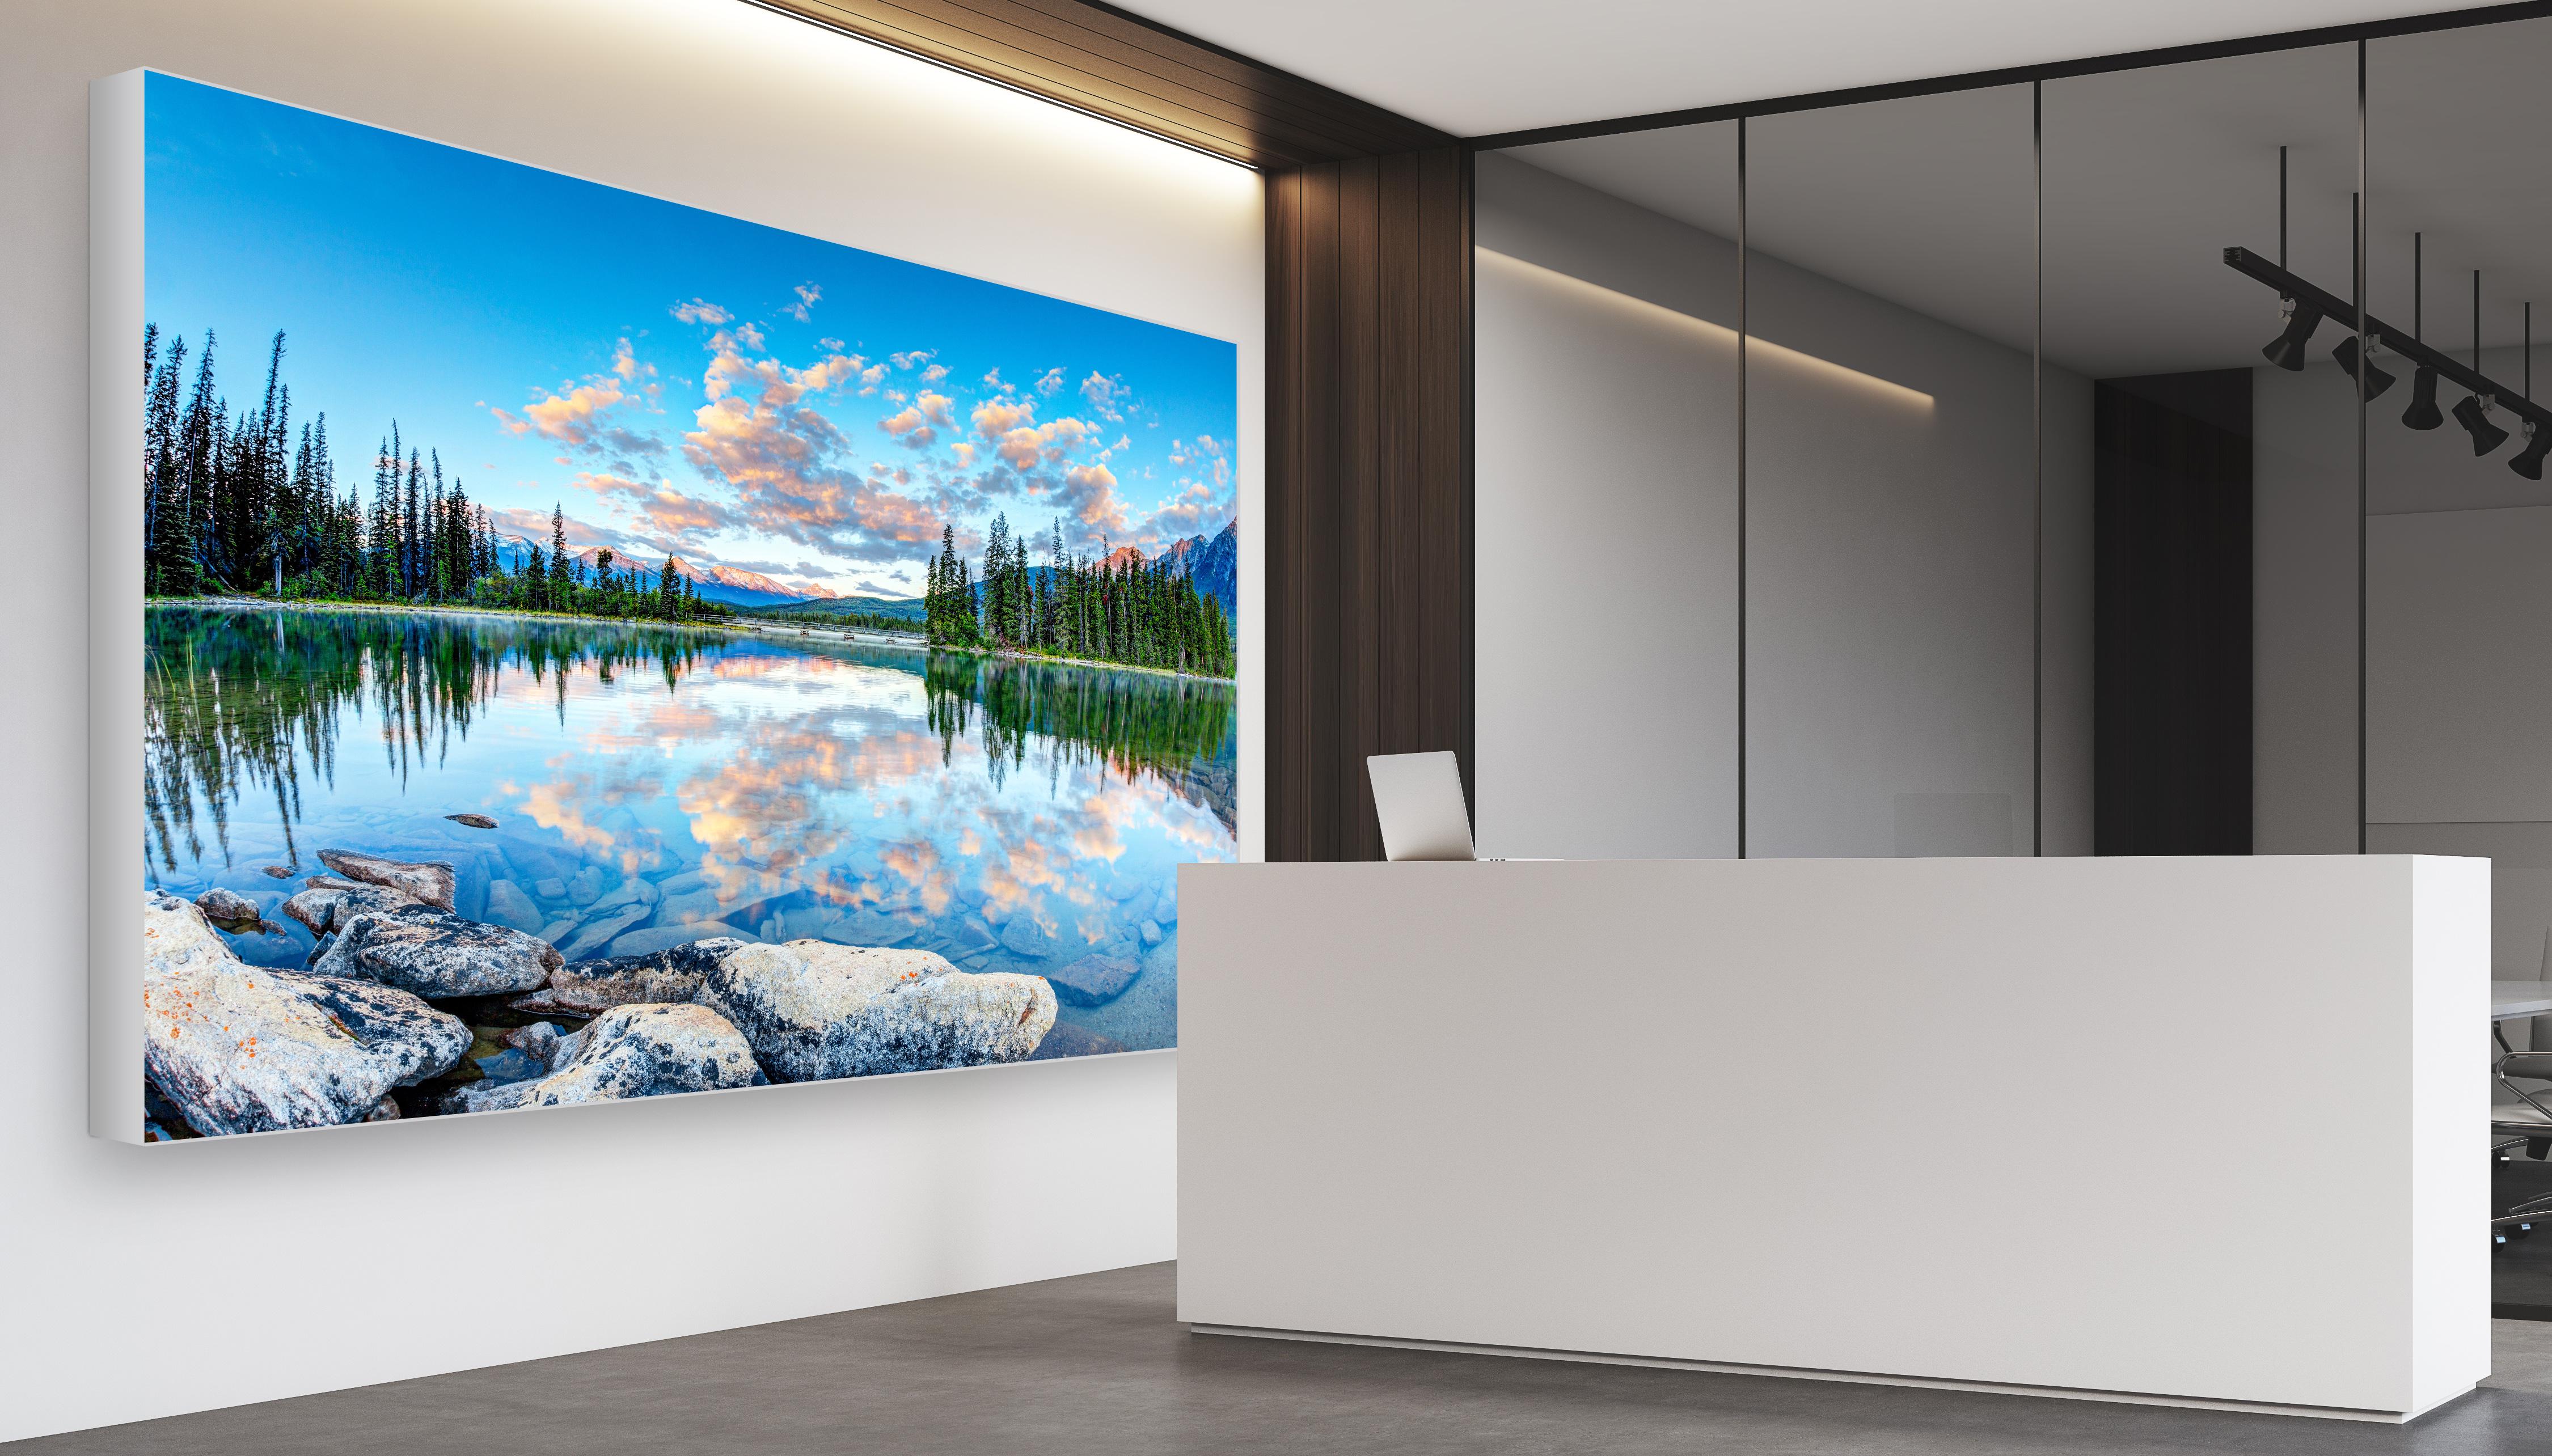 Messewand Easyframe haengend Wand Interior